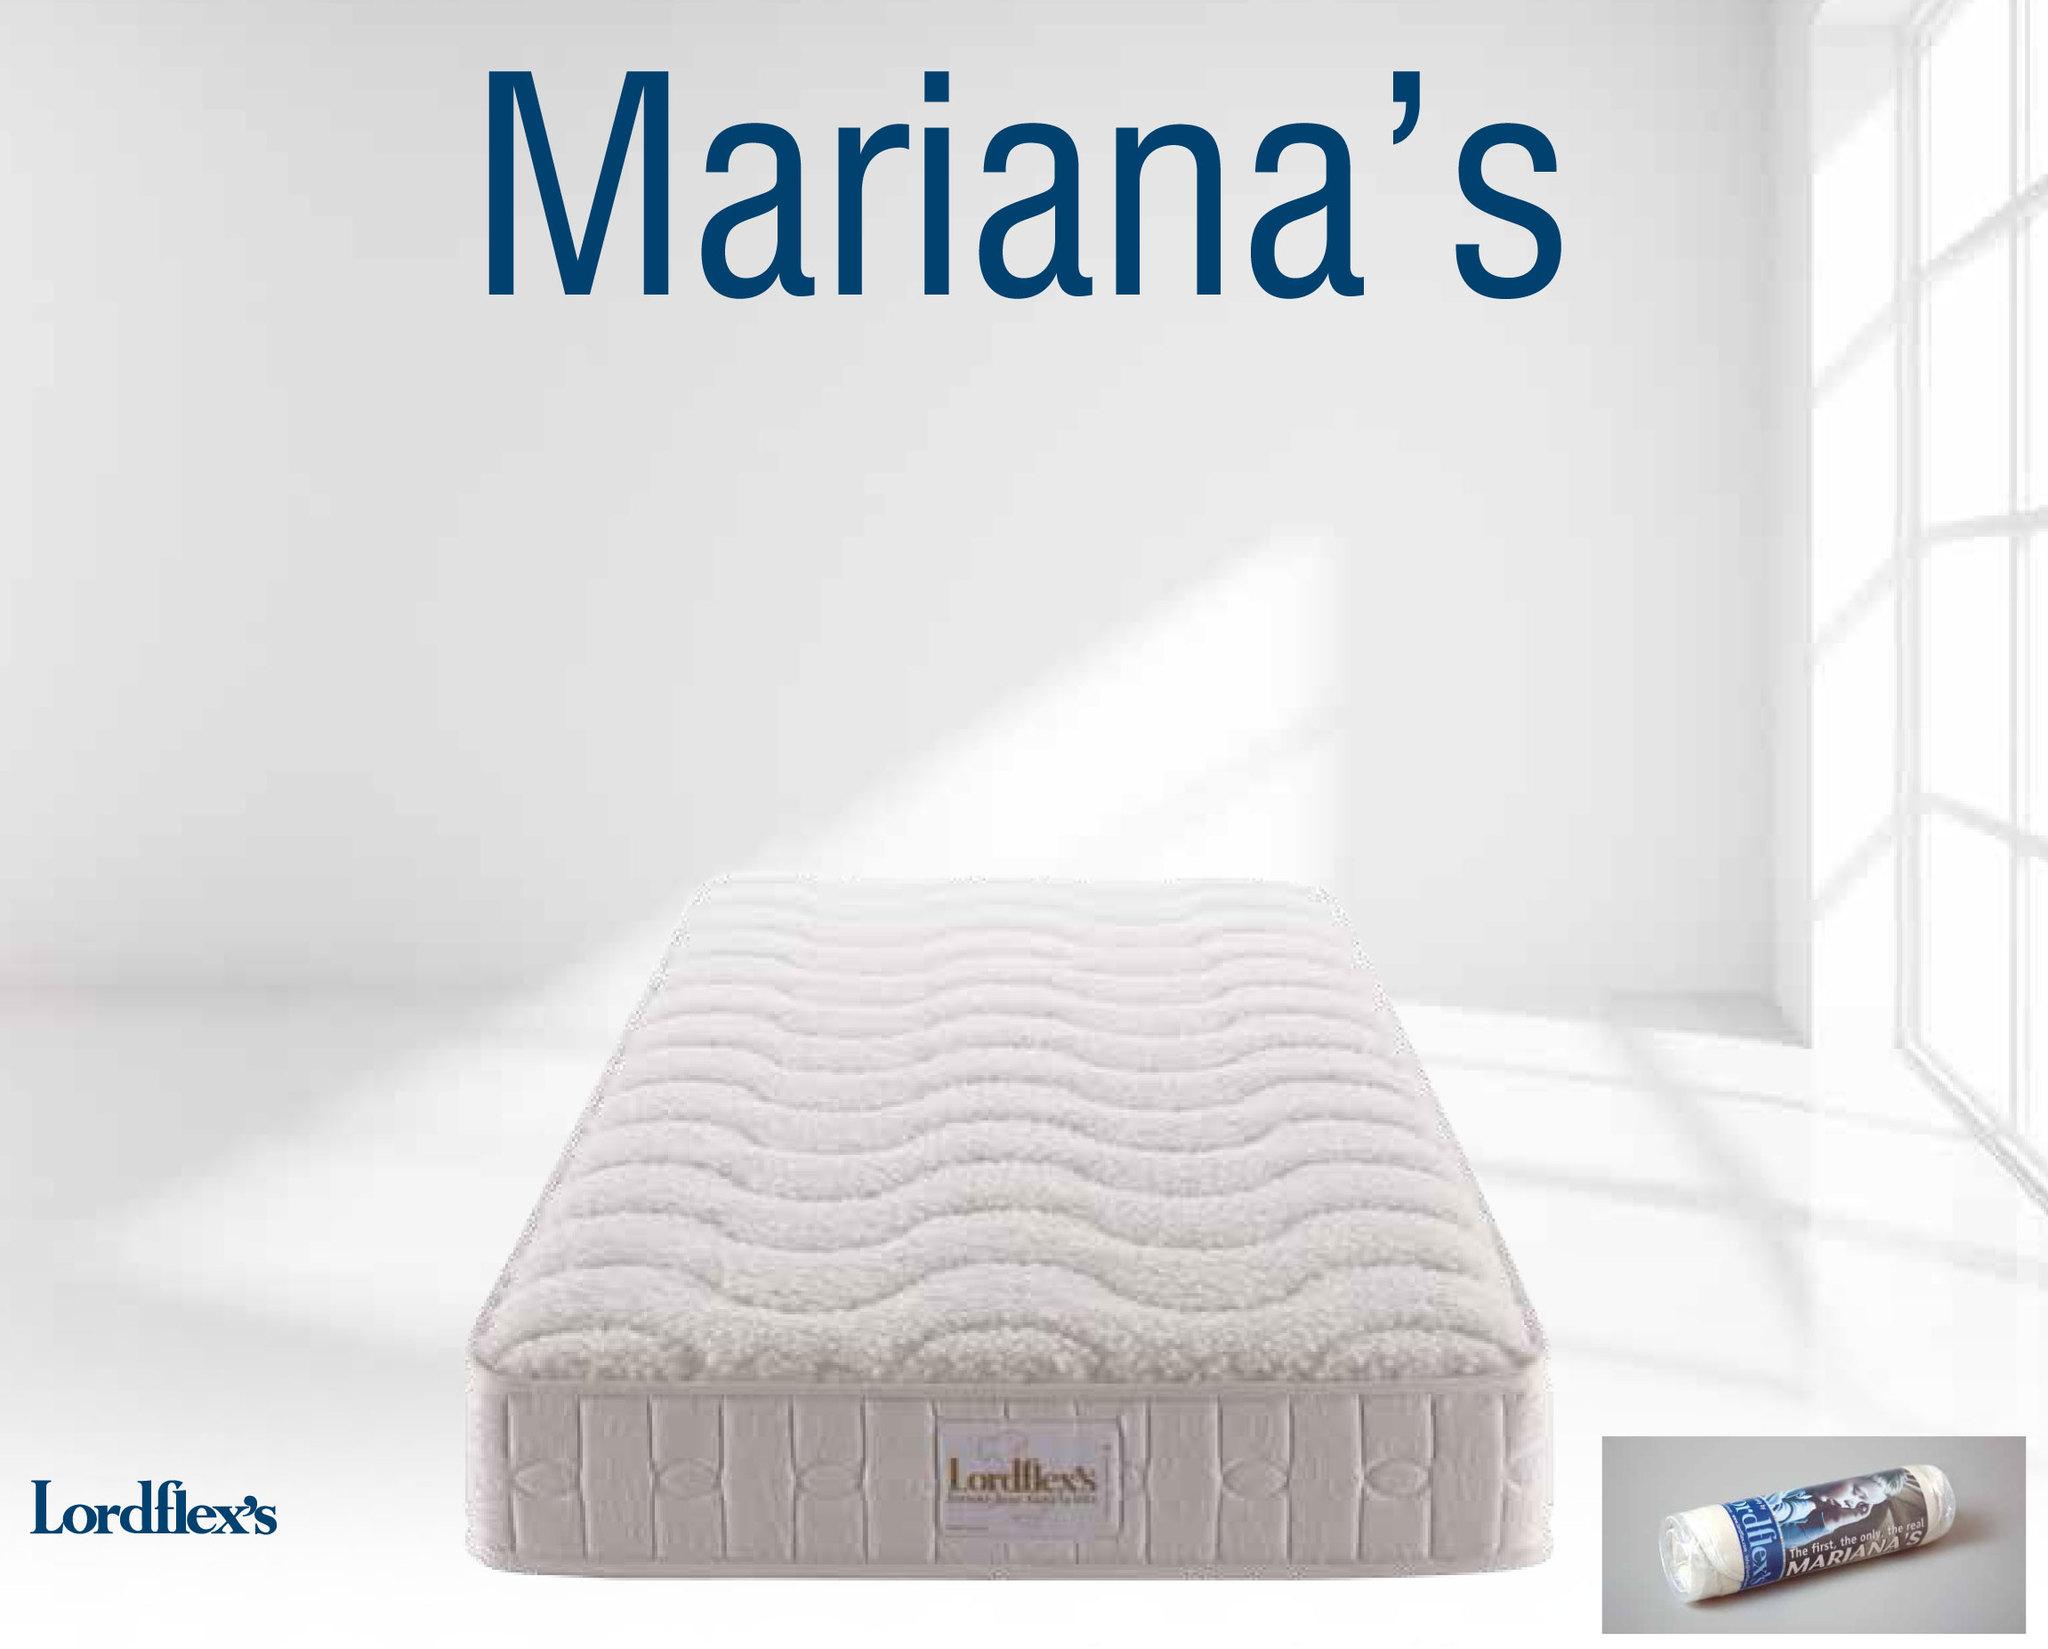 Матрасы Матрас ортопедический Lordflex's Mariana's 110х200 до 140 кг 1_Mariana_s.jpg